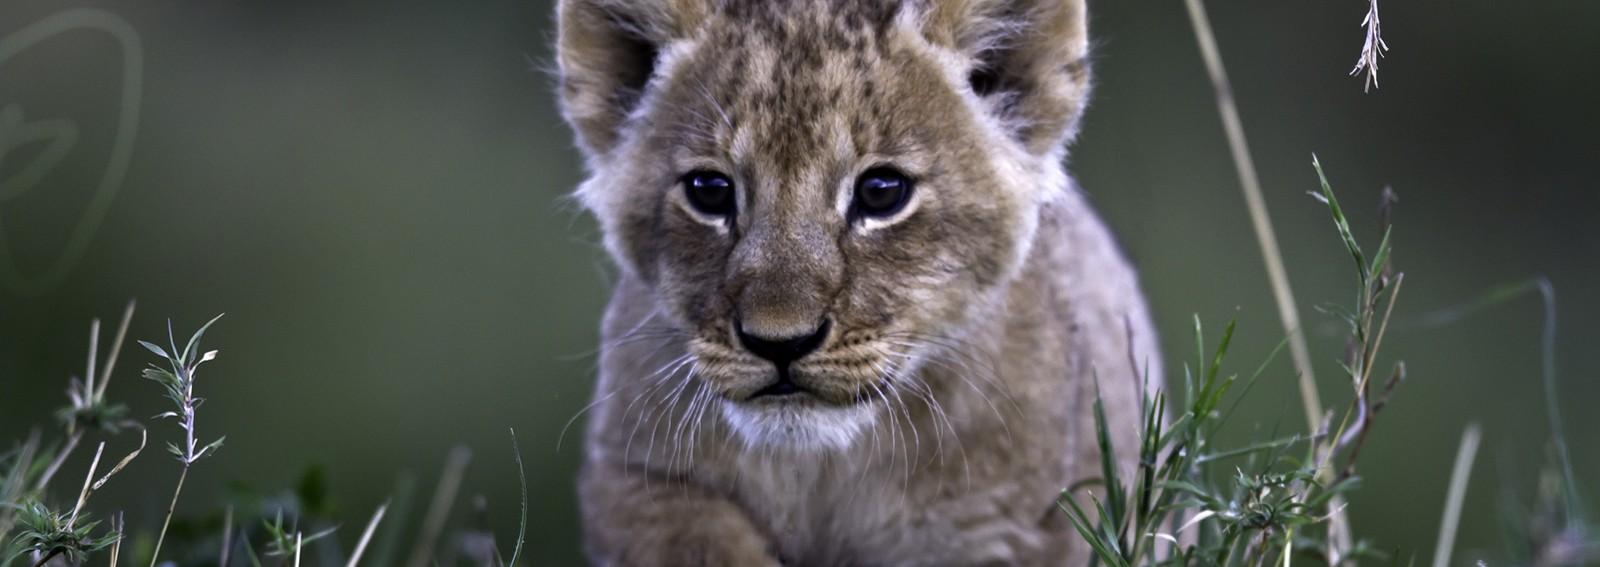 Adorable little lion cub makes an unlikely best pal